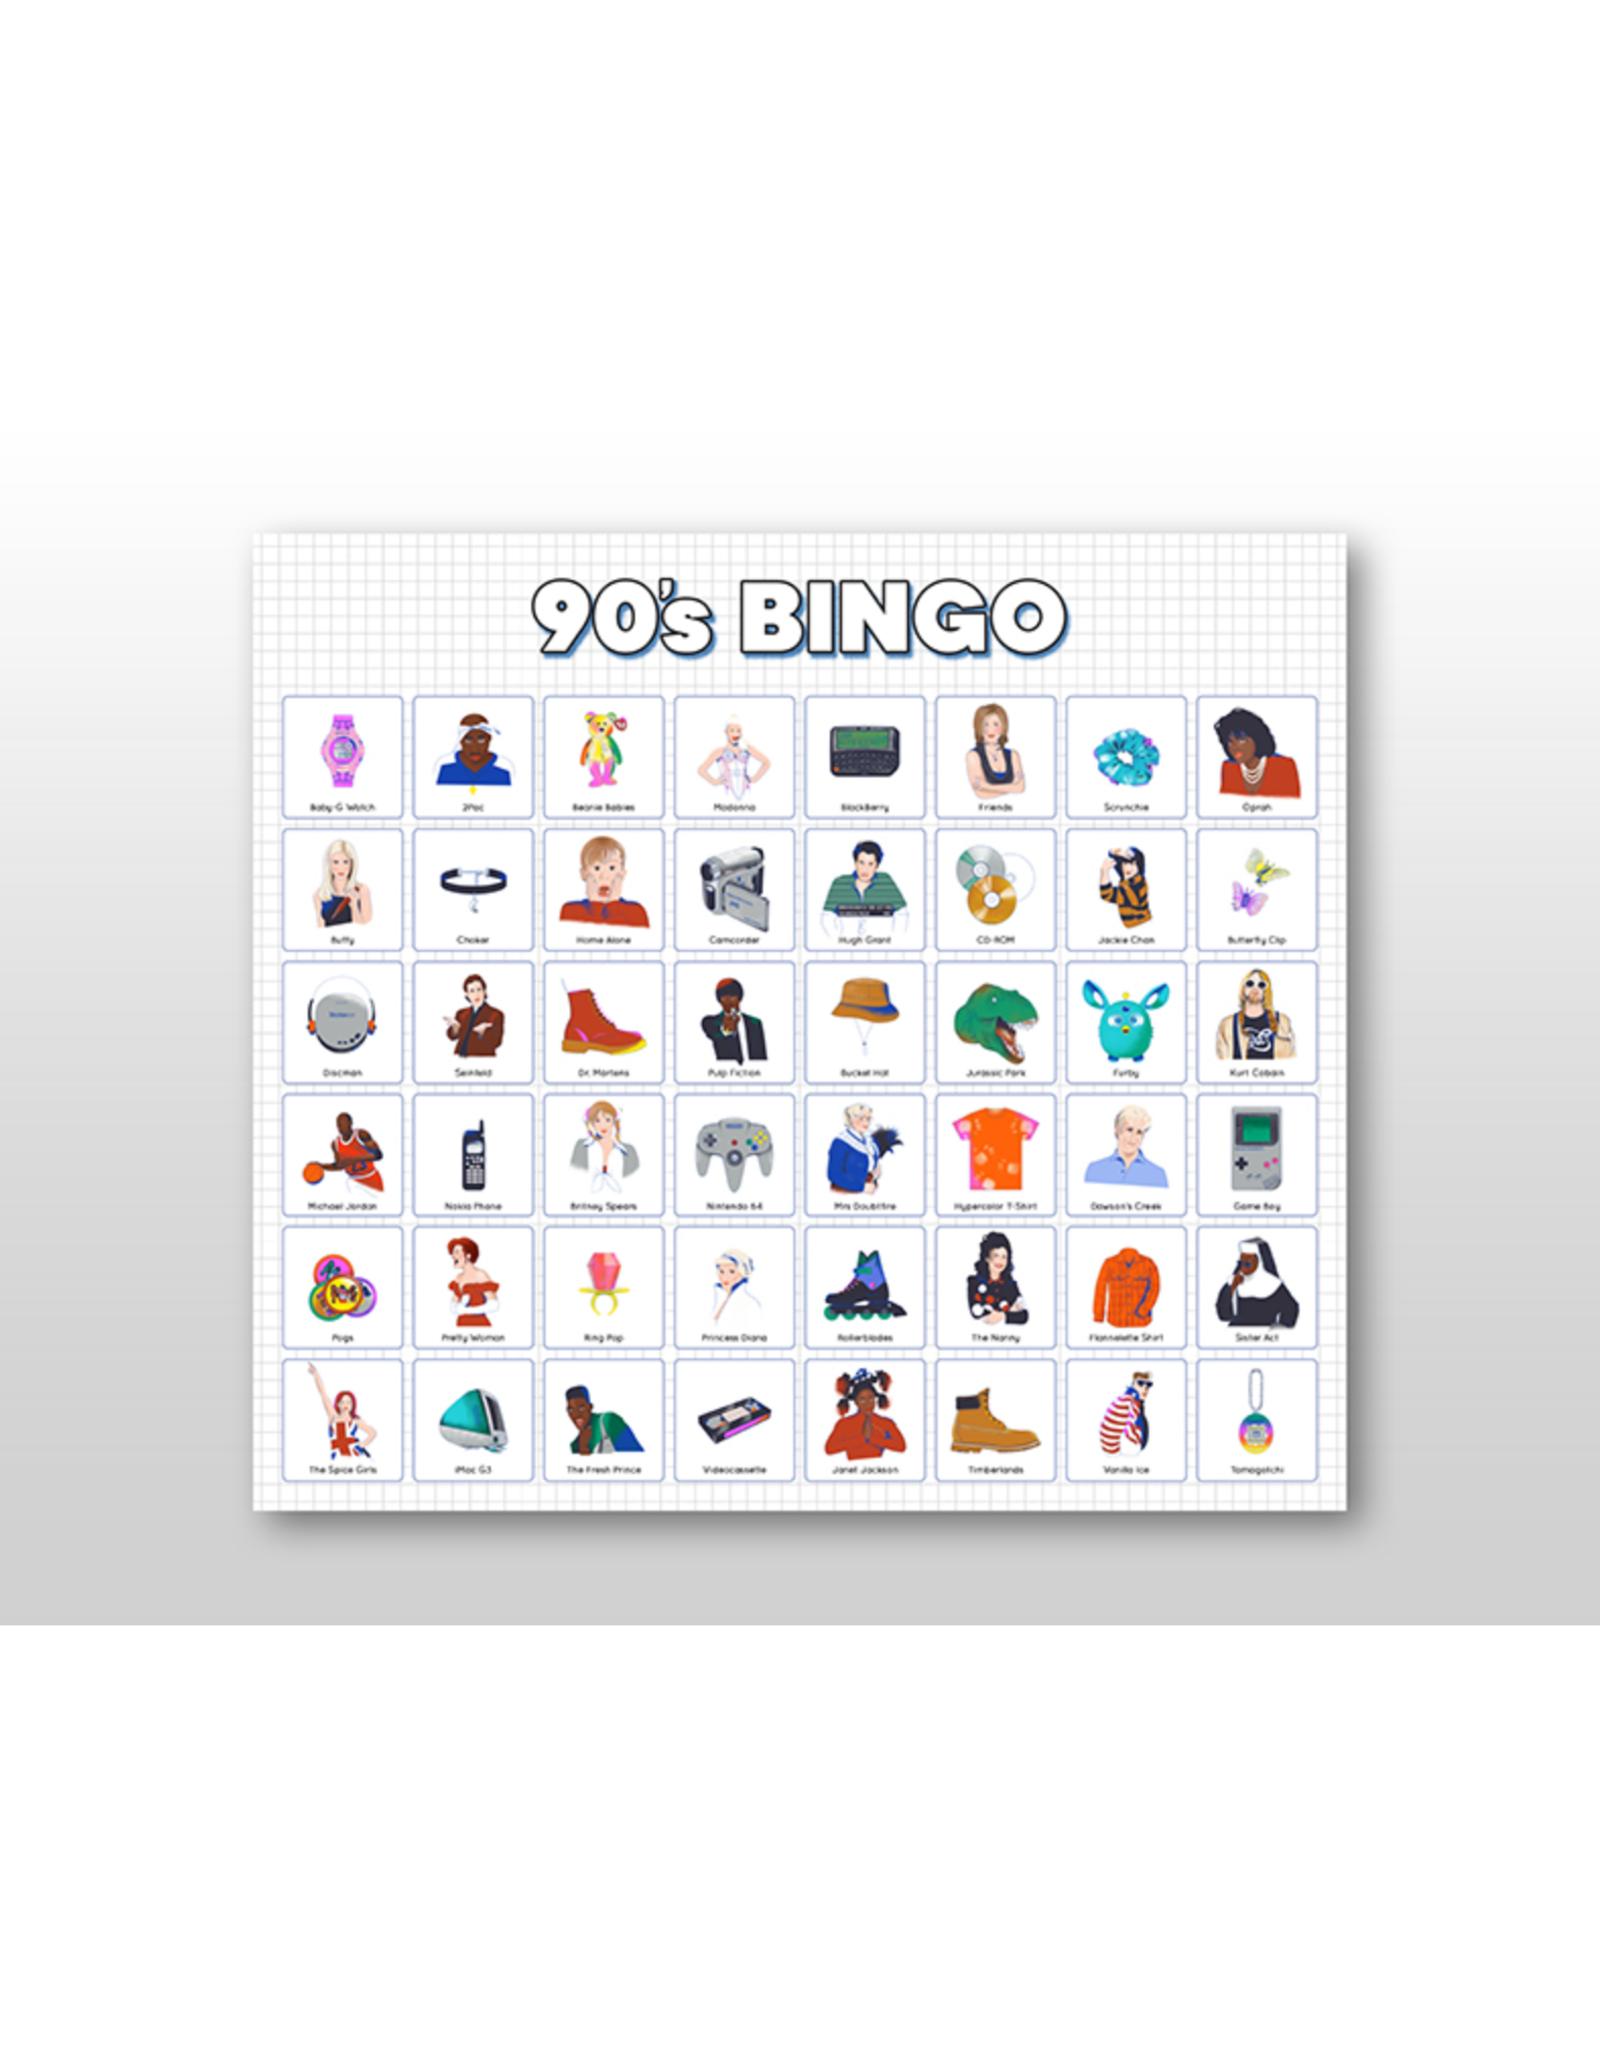 90s Bingo